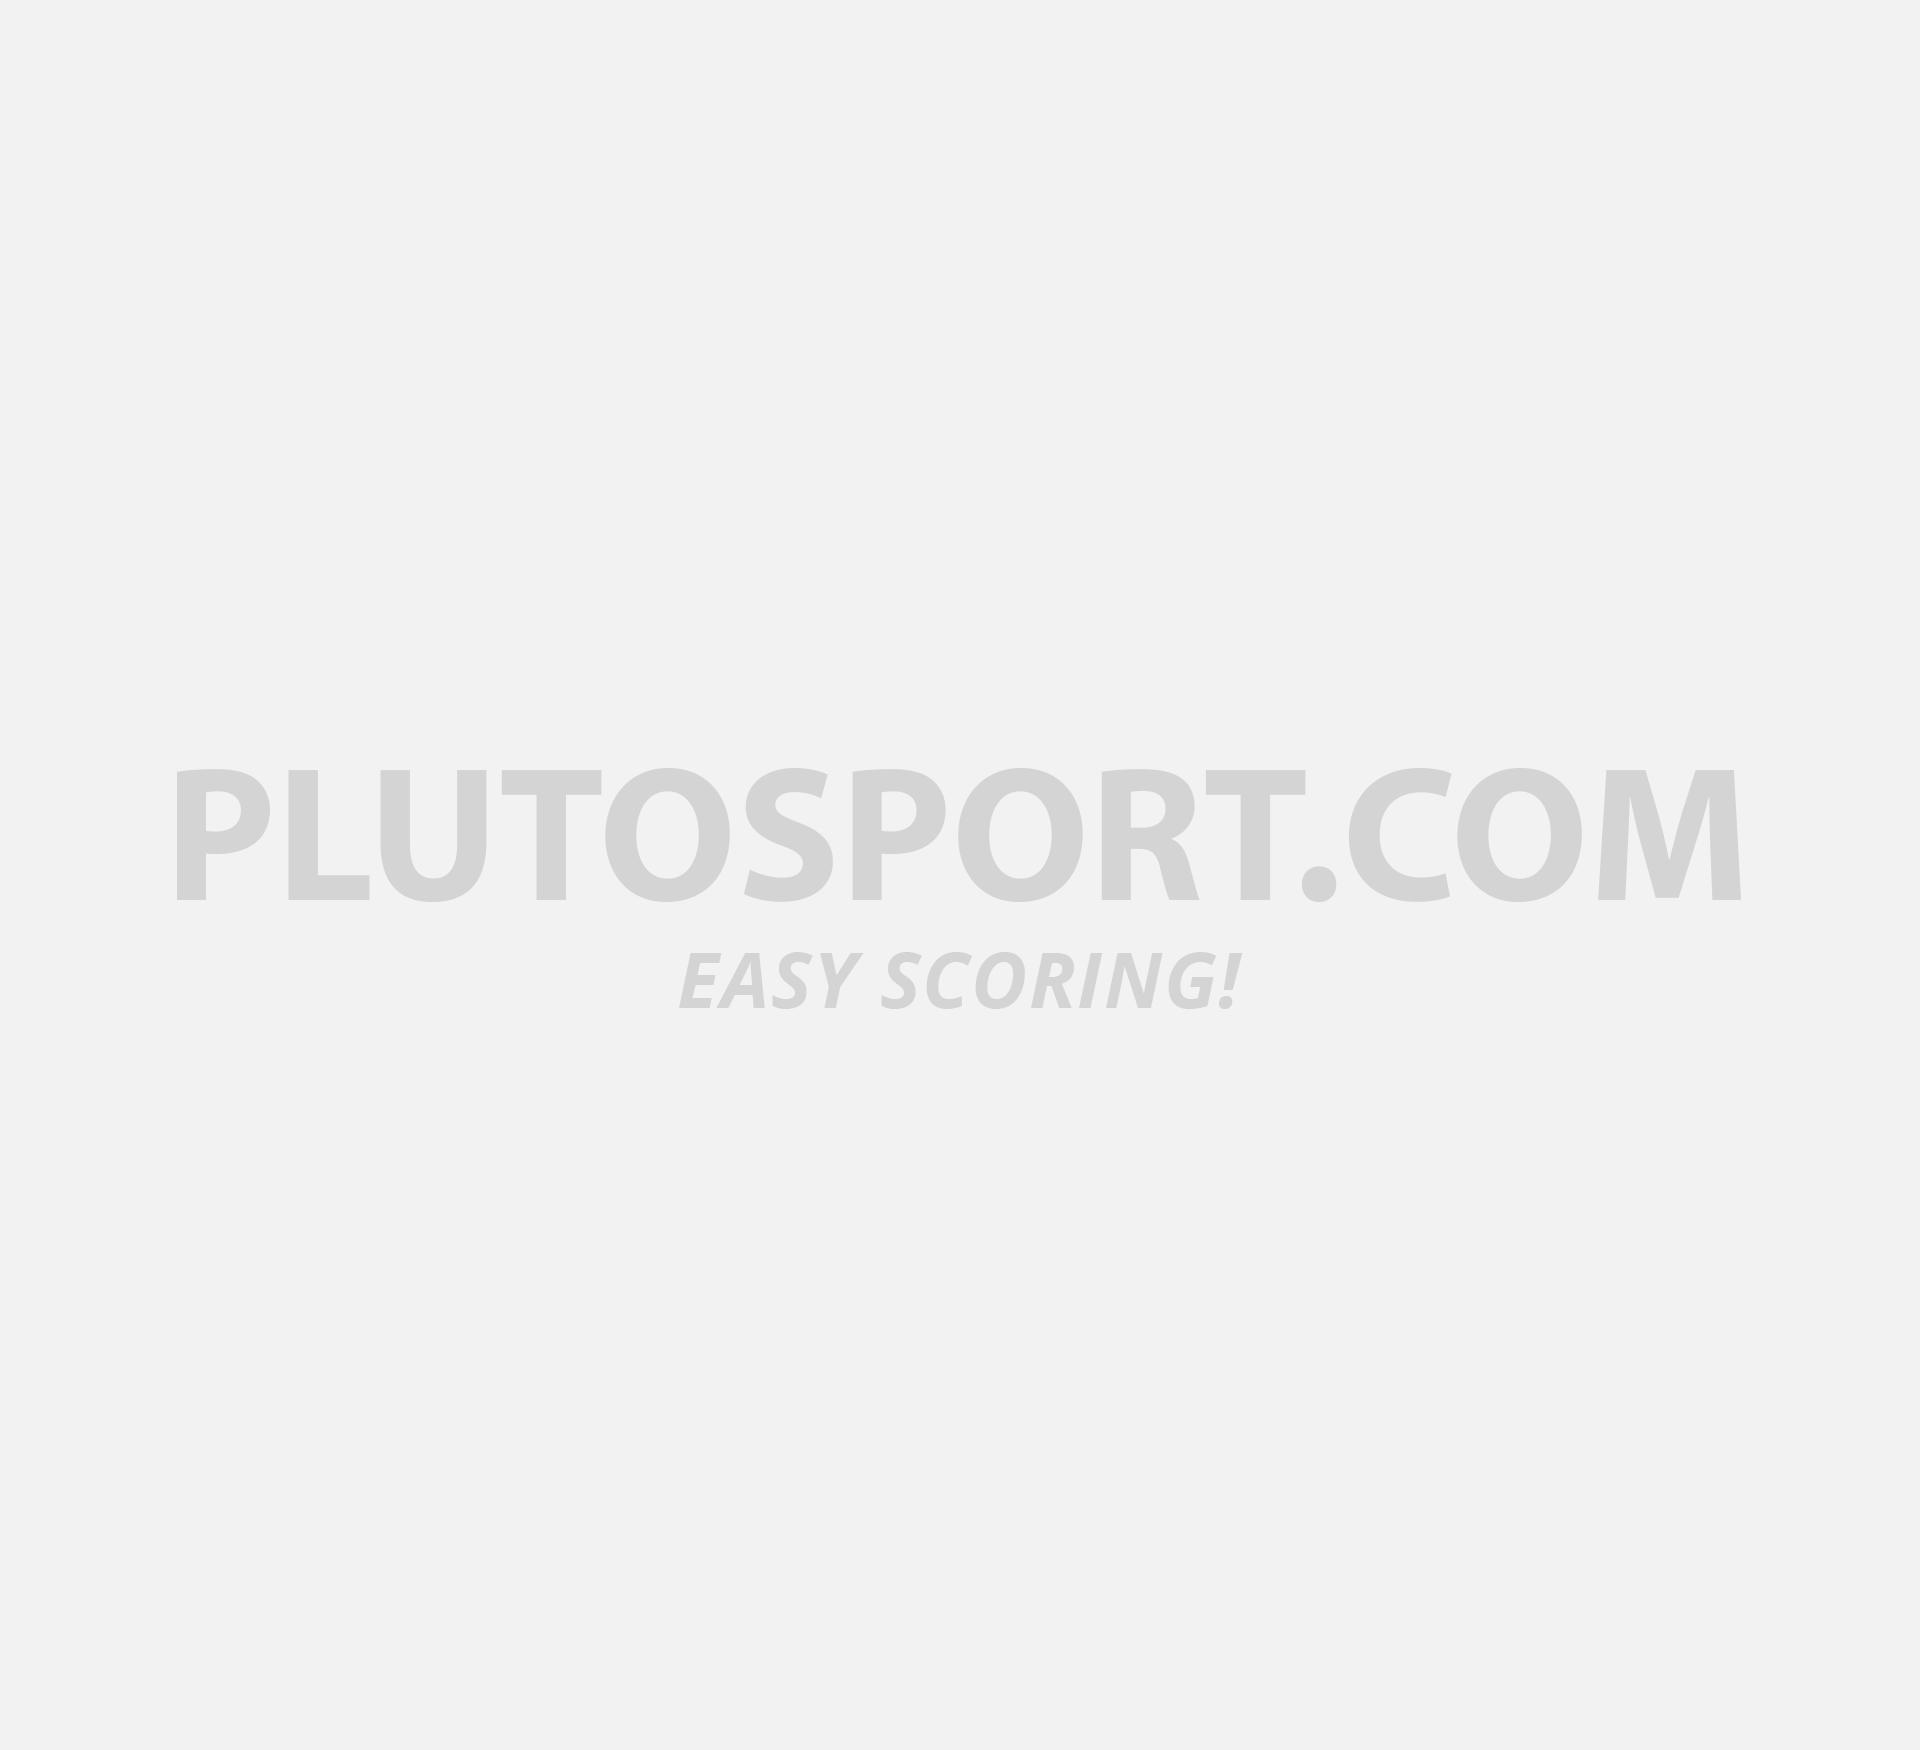 98f7c6dd1df Brabo Backpack Jr Pure Love - Bags - Hockey - Sports | Plutosport